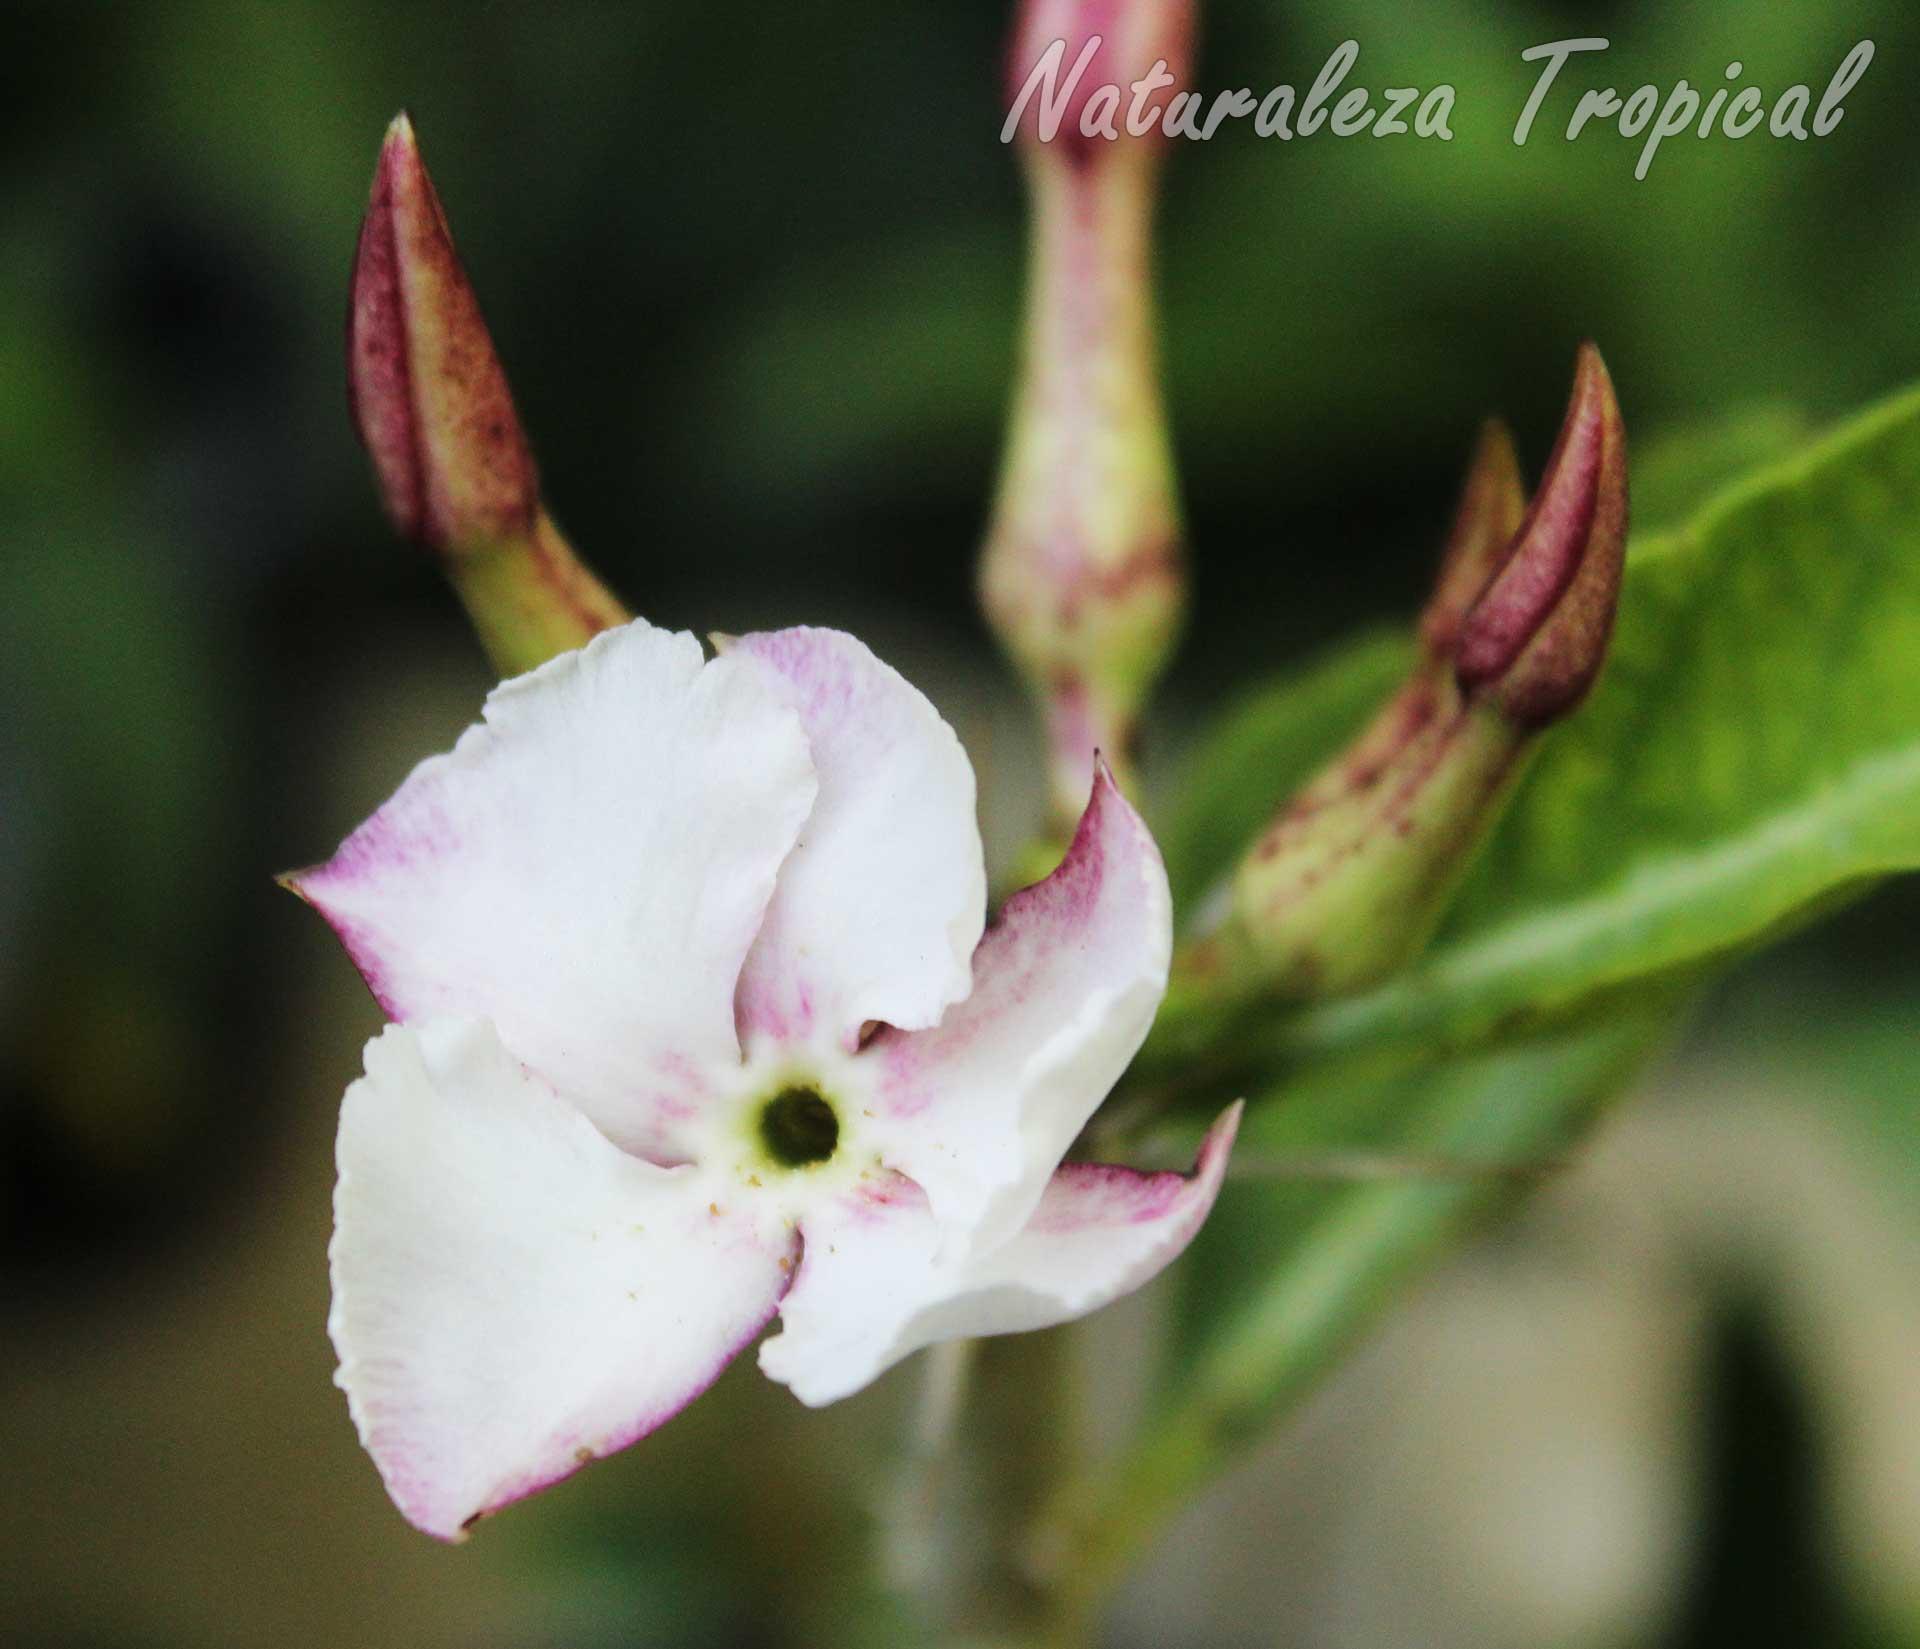 Flor típica de la planta suculenta Pachypodium lealii subs. saundersii